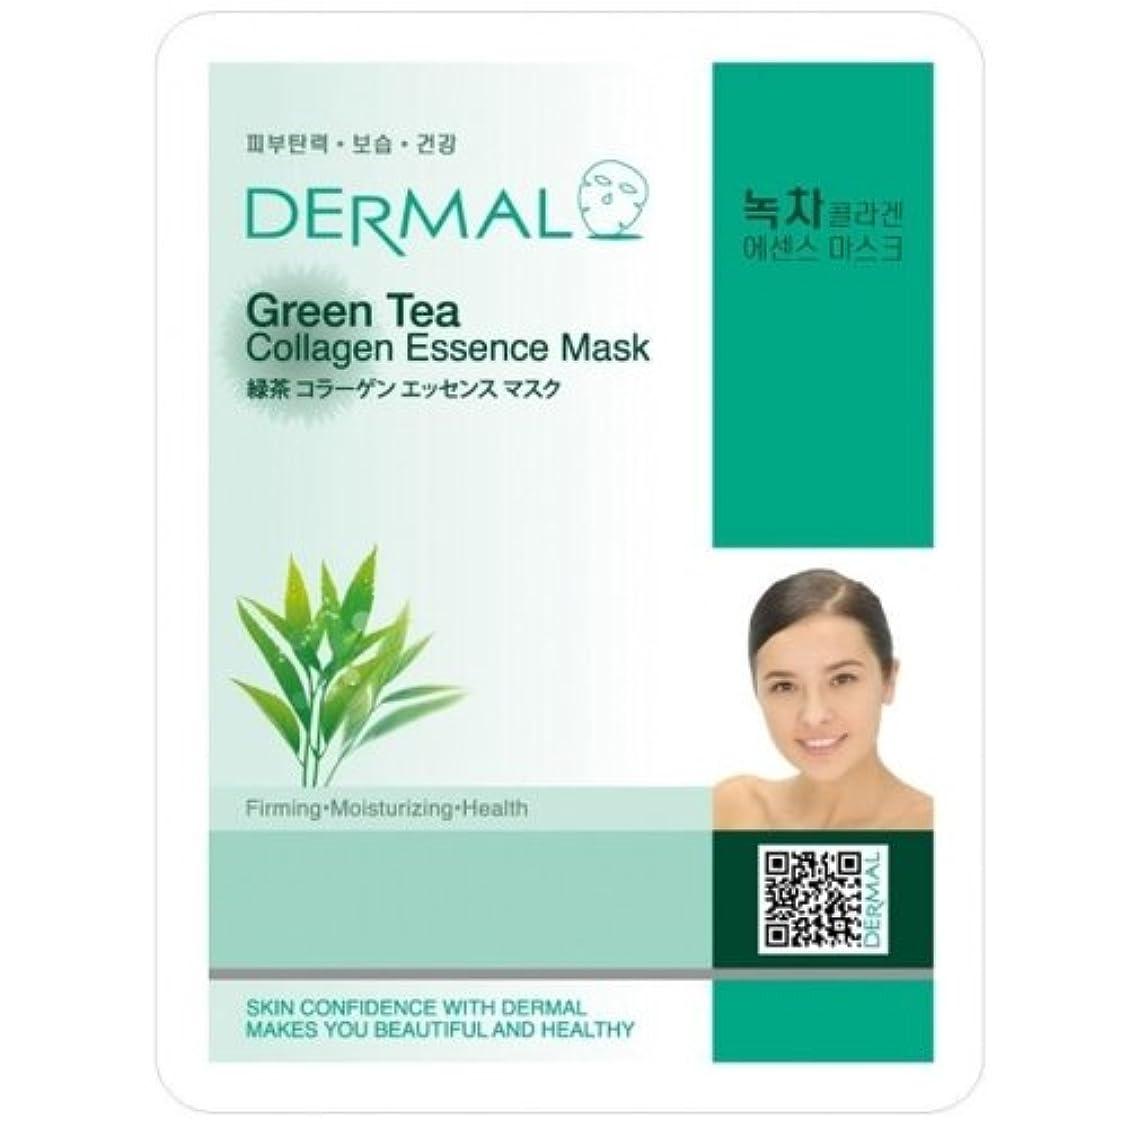 【DERMAL】ダーマル シートマスク 緑茶 10枚セット/保湿/フェイスマスク/フェイスパック/マスクパック/韓国コスメ [メール便]